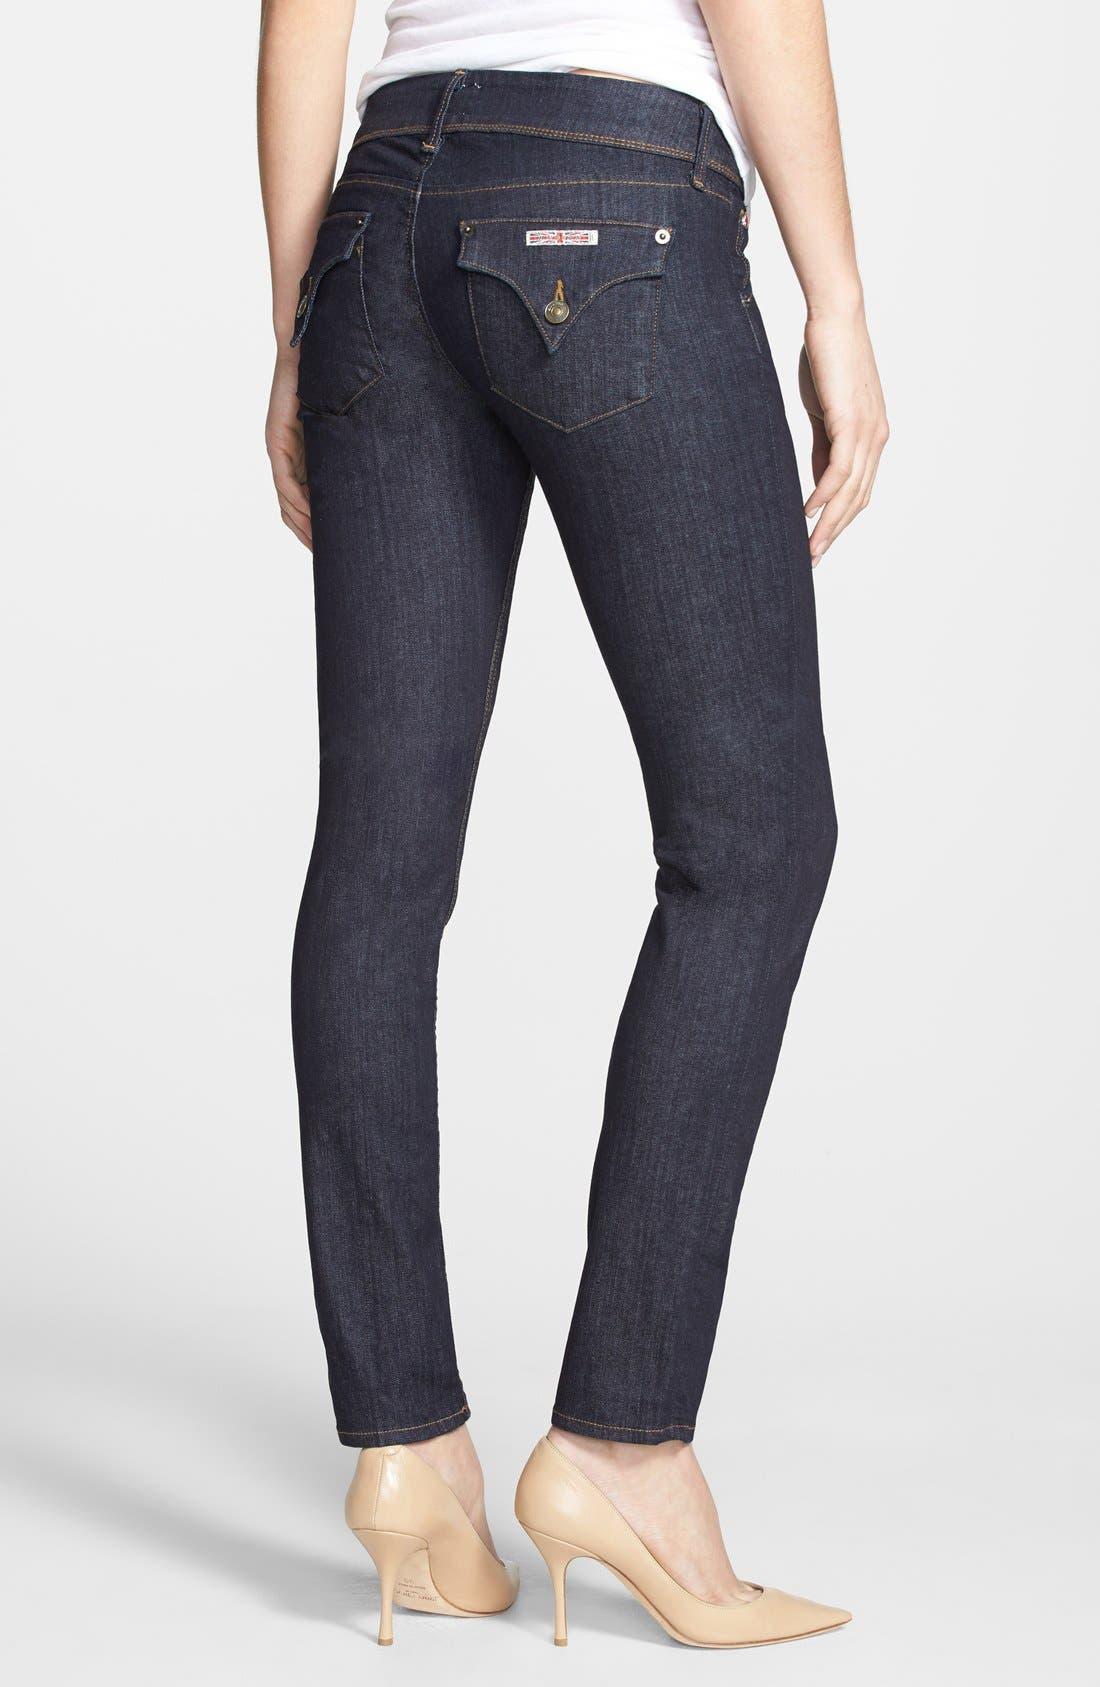 Alternate Image 2  - Hudson Jeans 'Collin' Skinny Jeans (Foley)